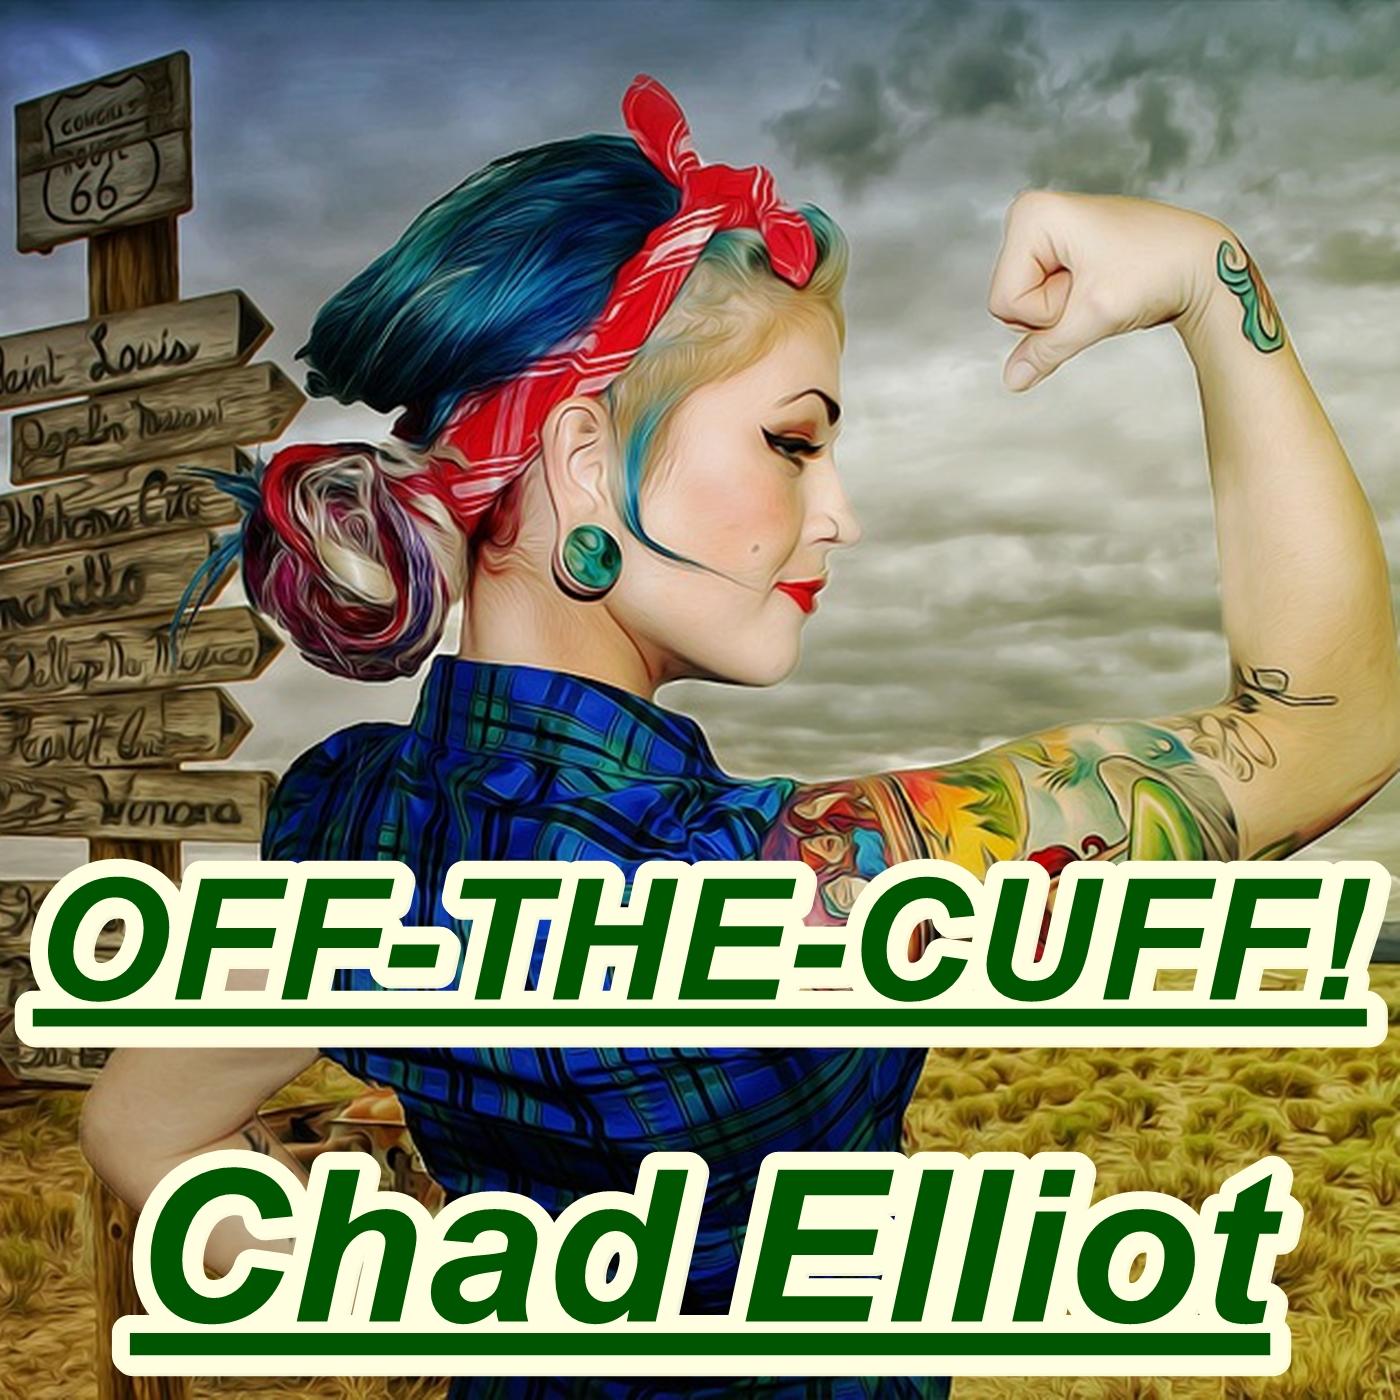 The OFF-THE-CUFF Improv Comedy Podcast.